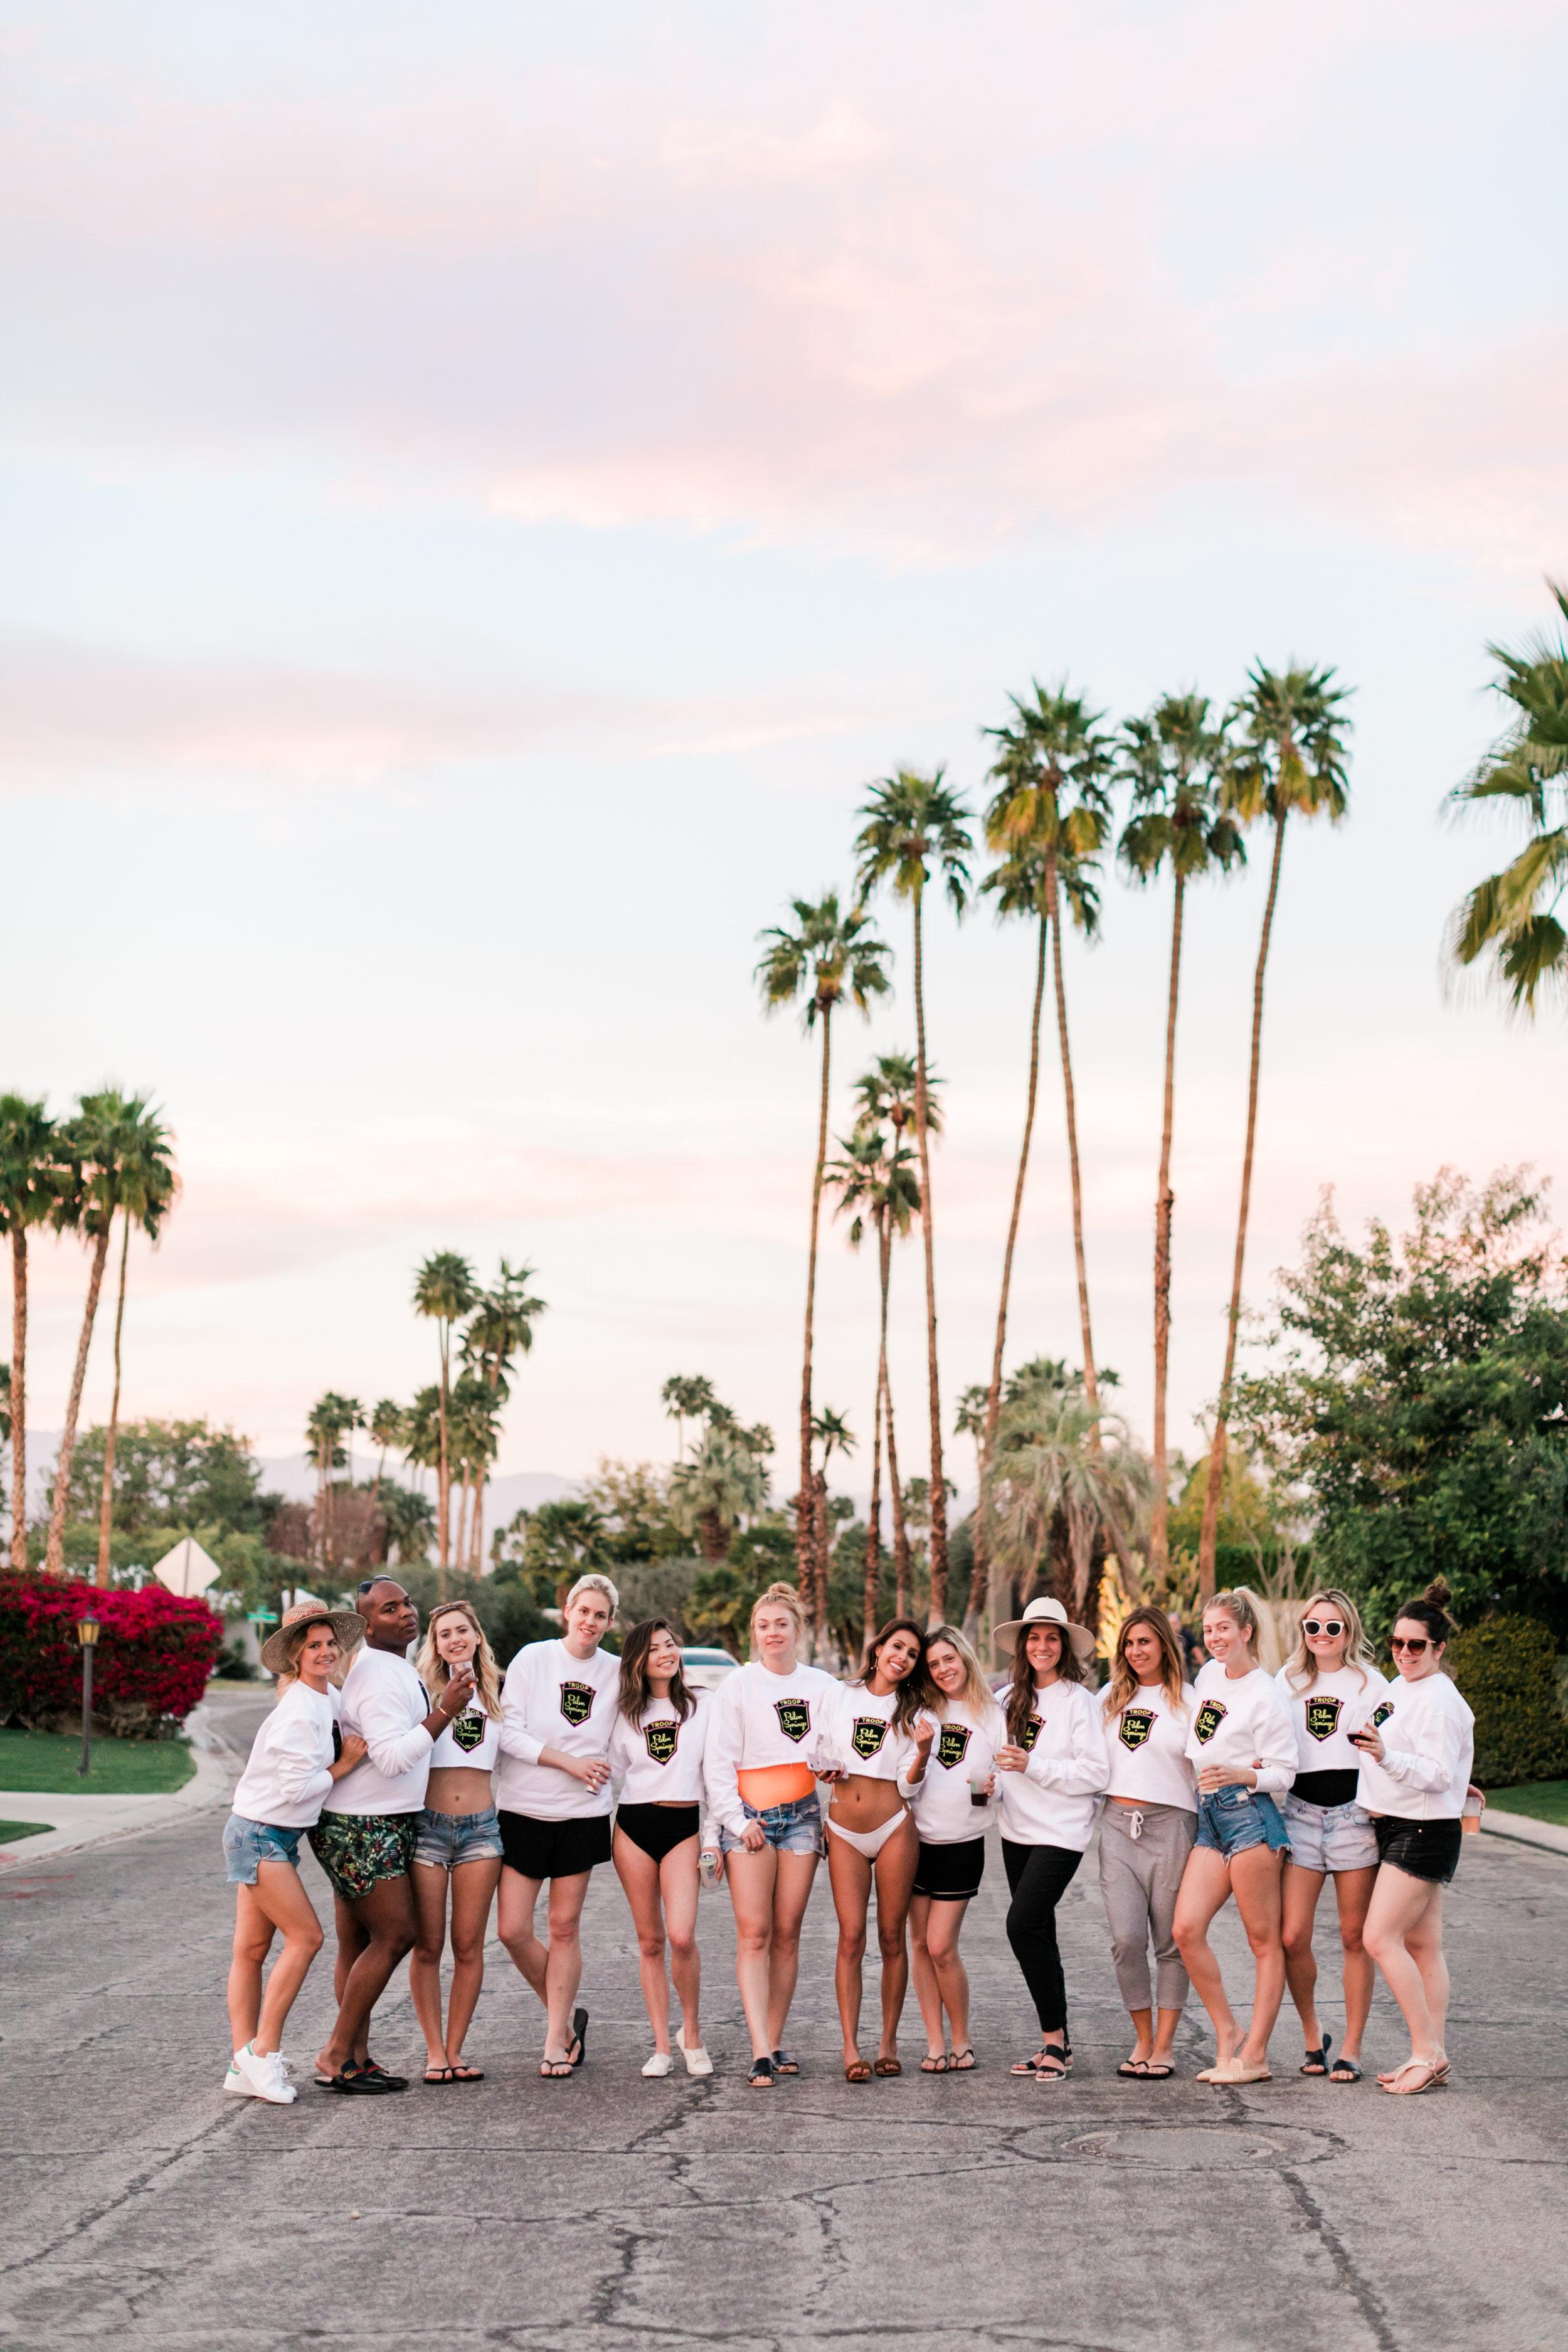 Palm Springs Sunset Walk - Everyday Pursuits Bachelorette